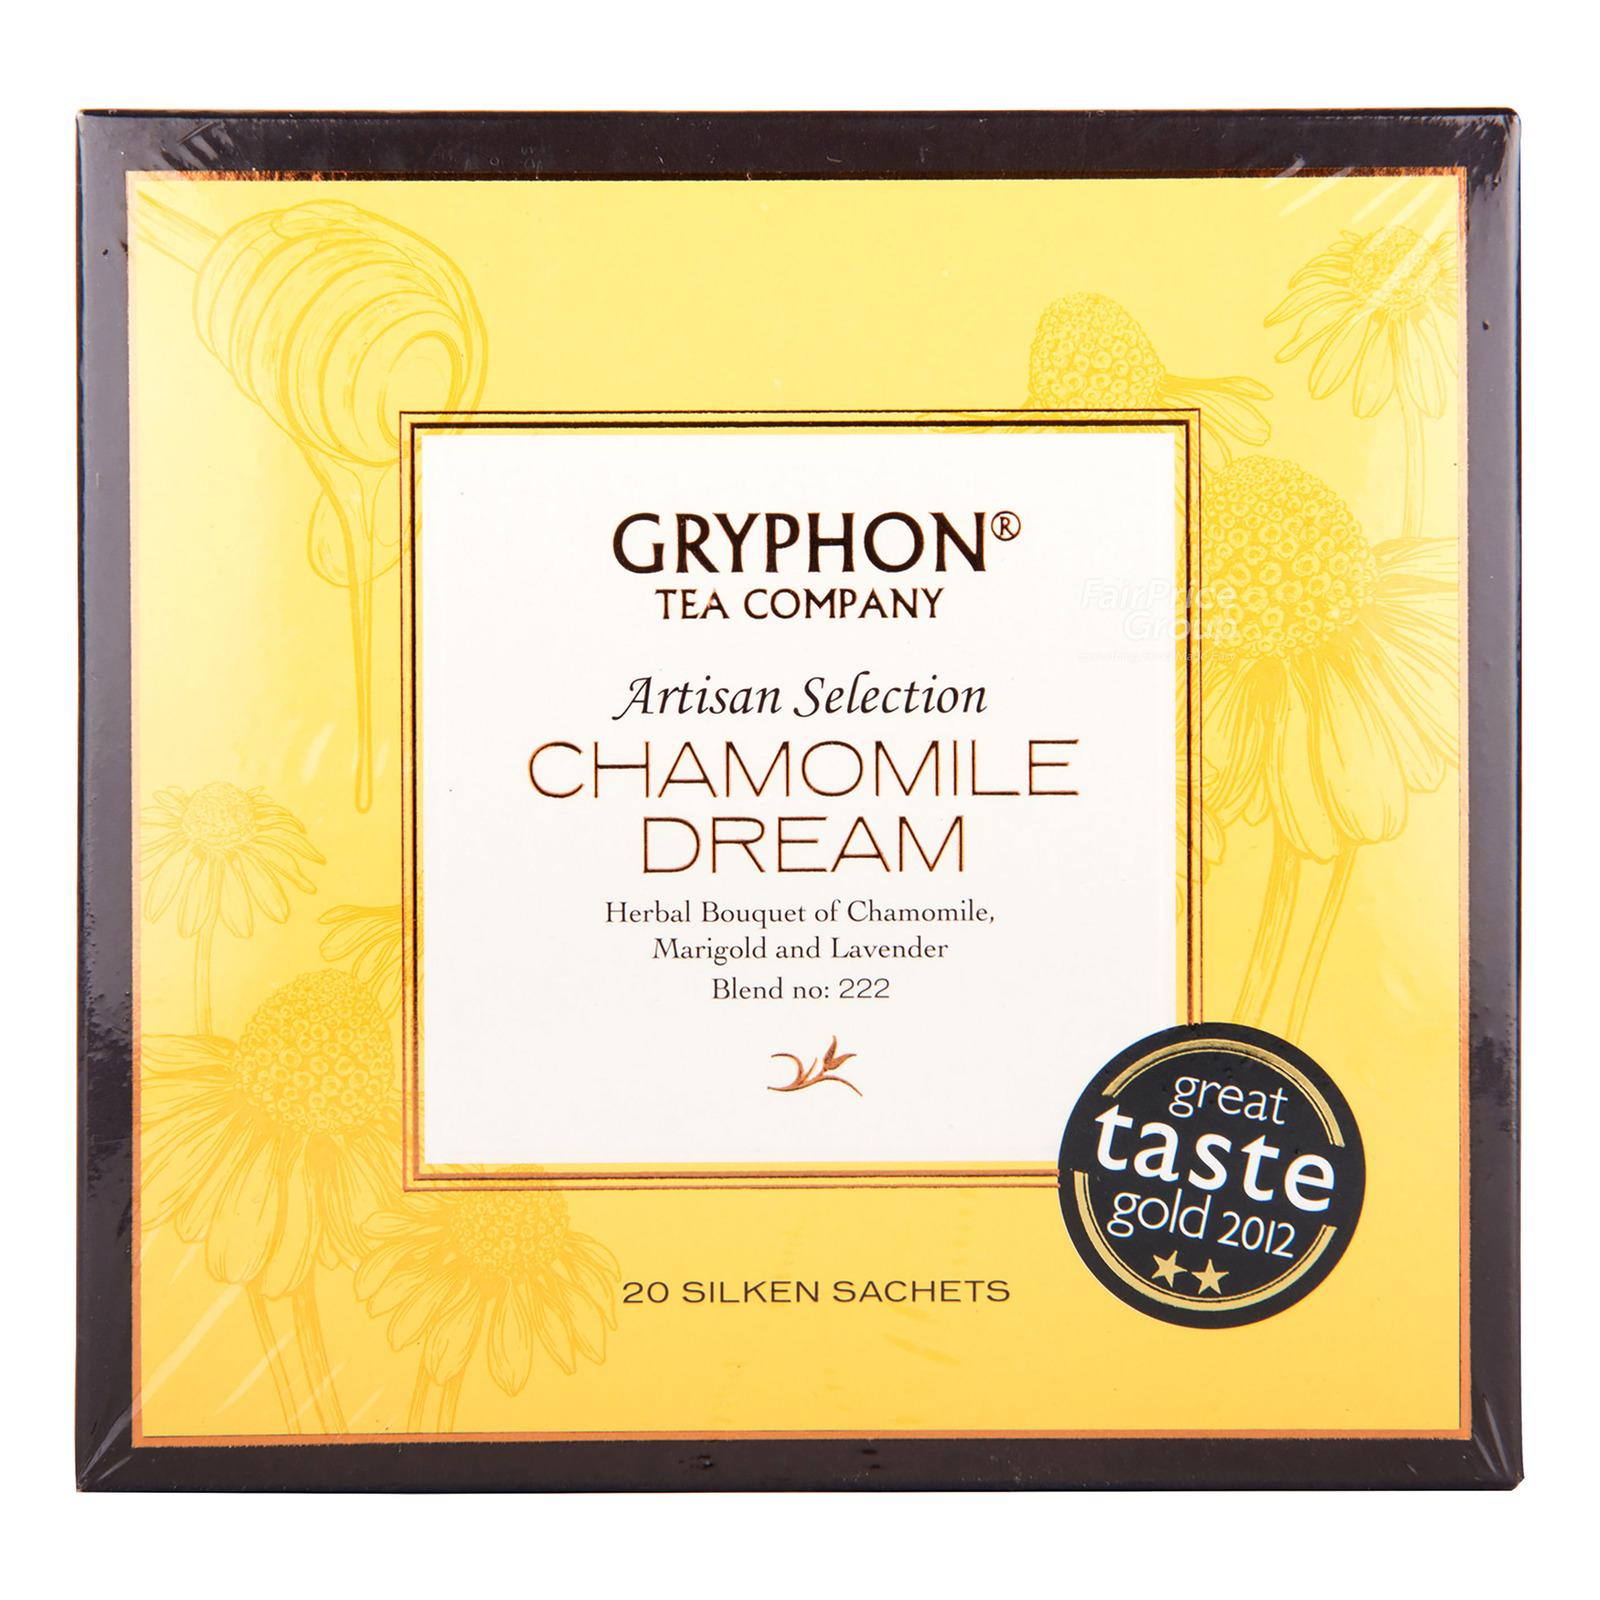 Gryphon Artisan Selection Tea - Chamomile Dream